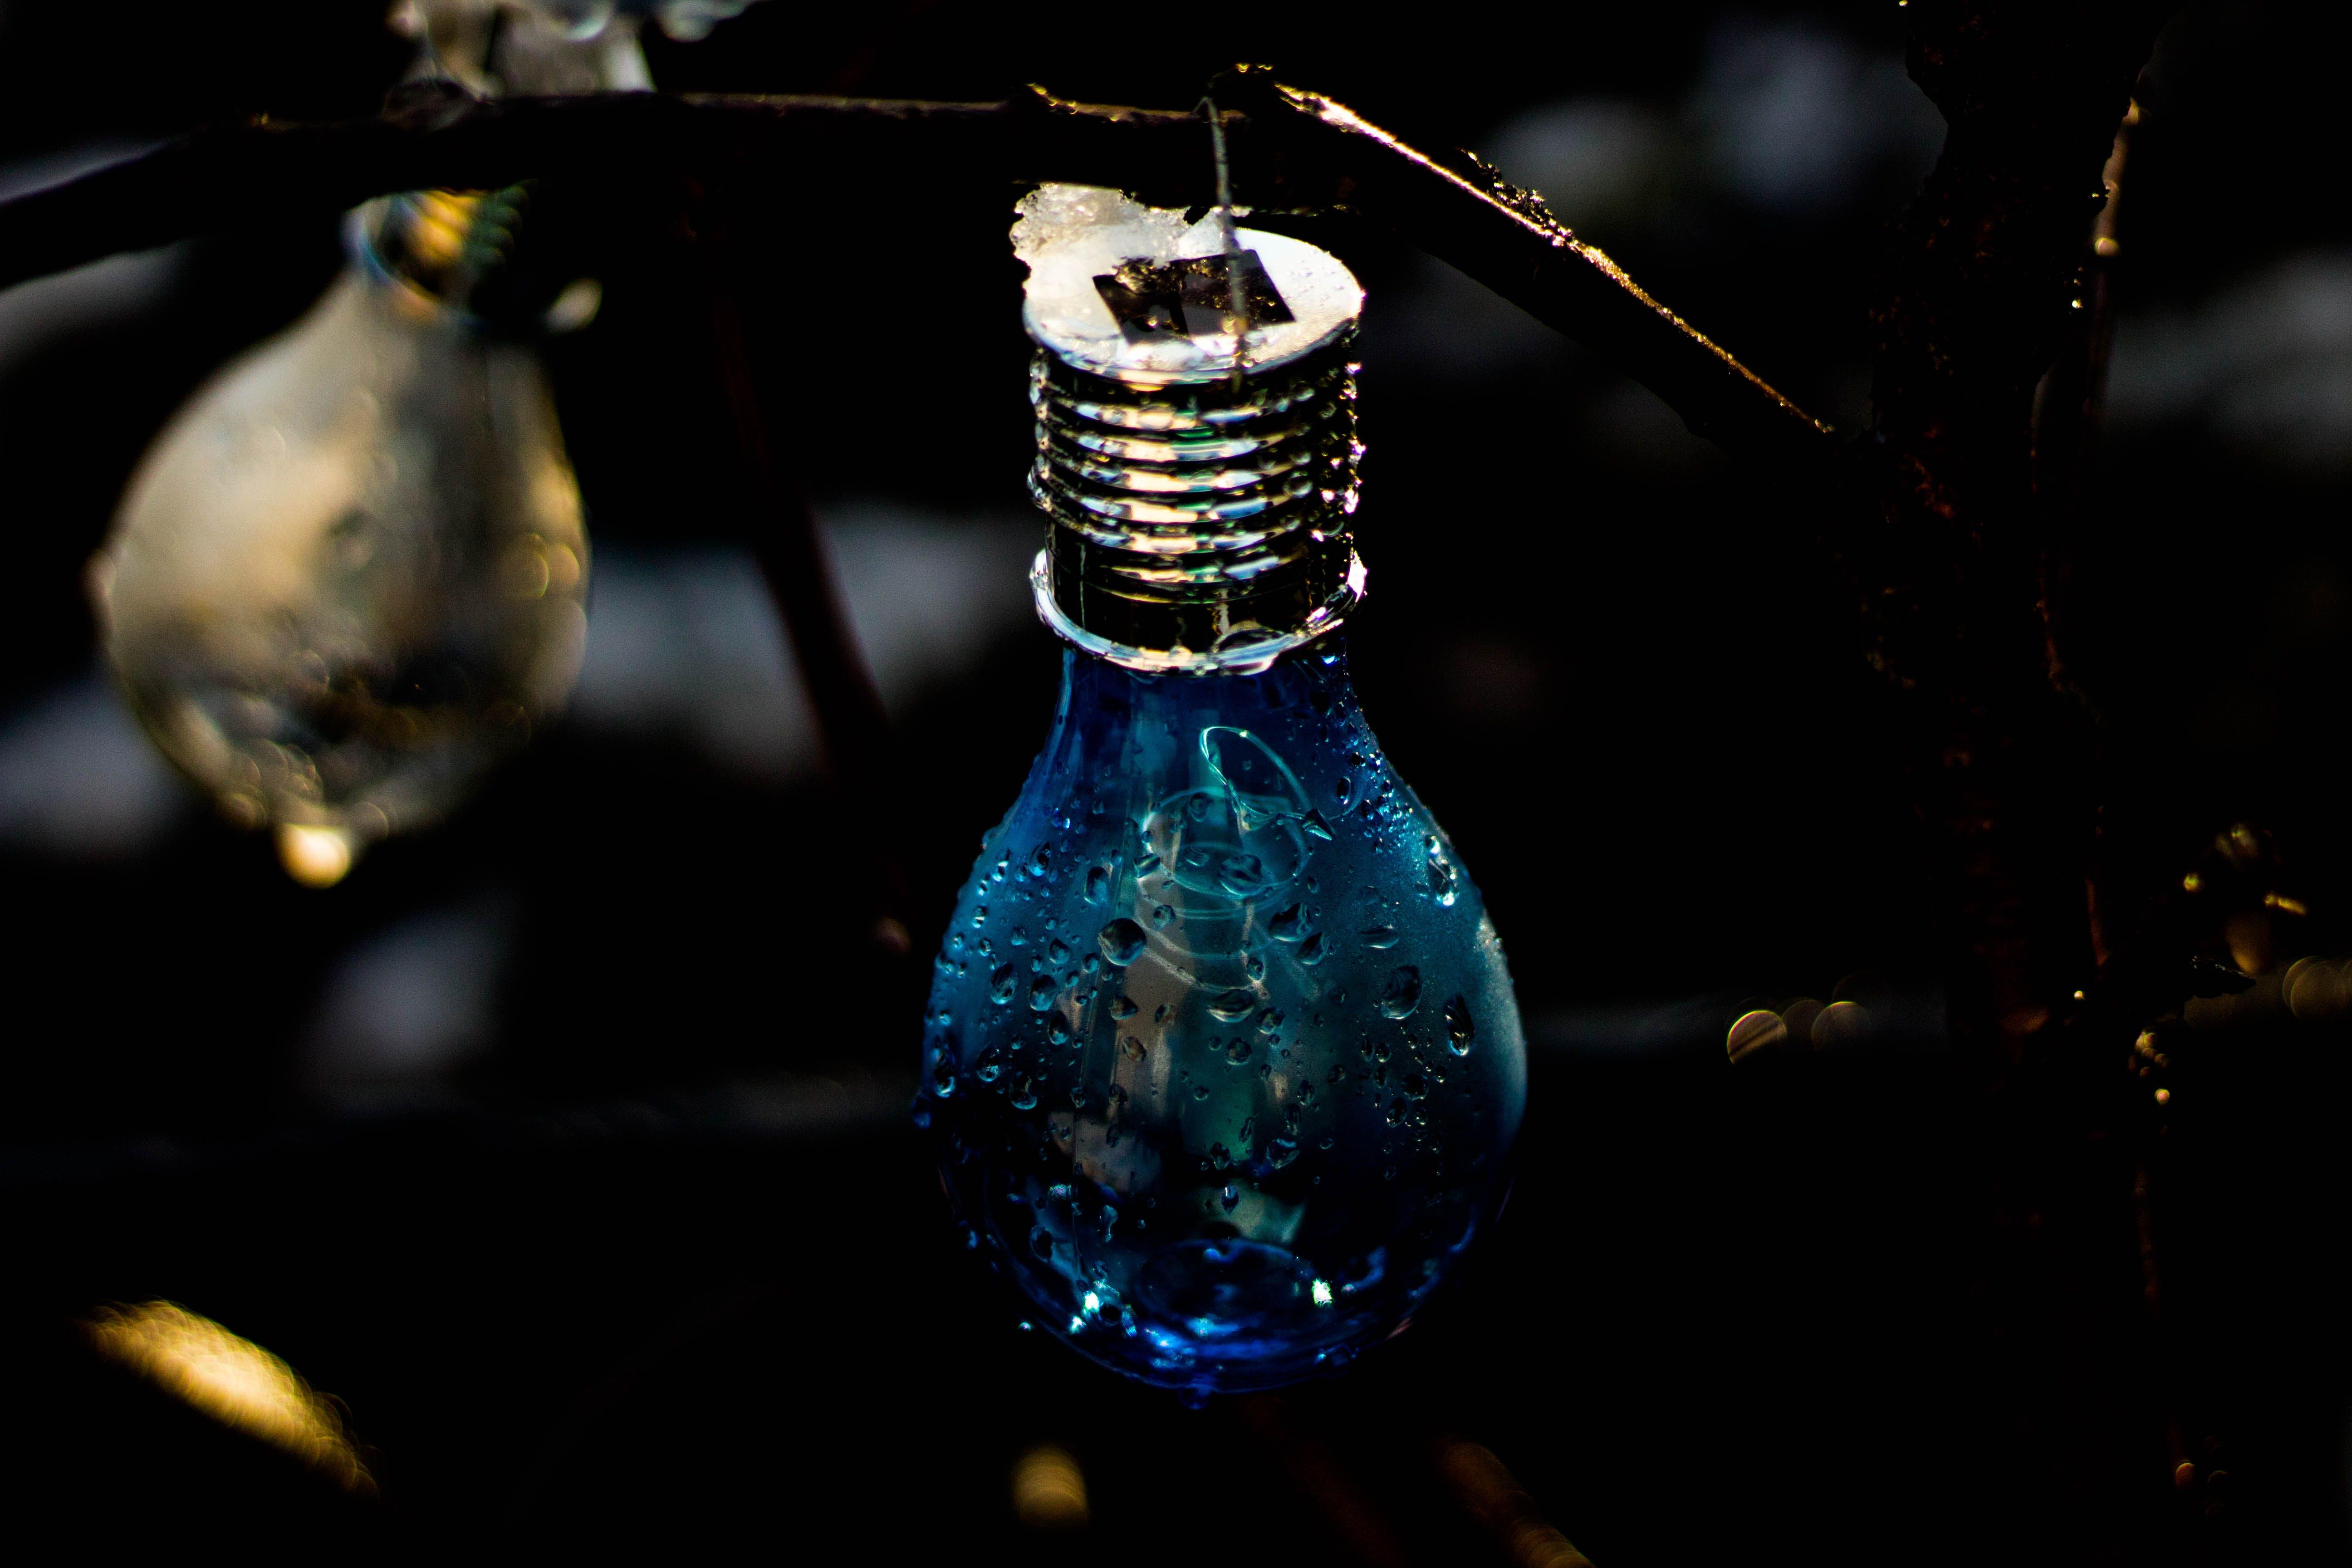 Closeup Photo of Blue Light Bulb